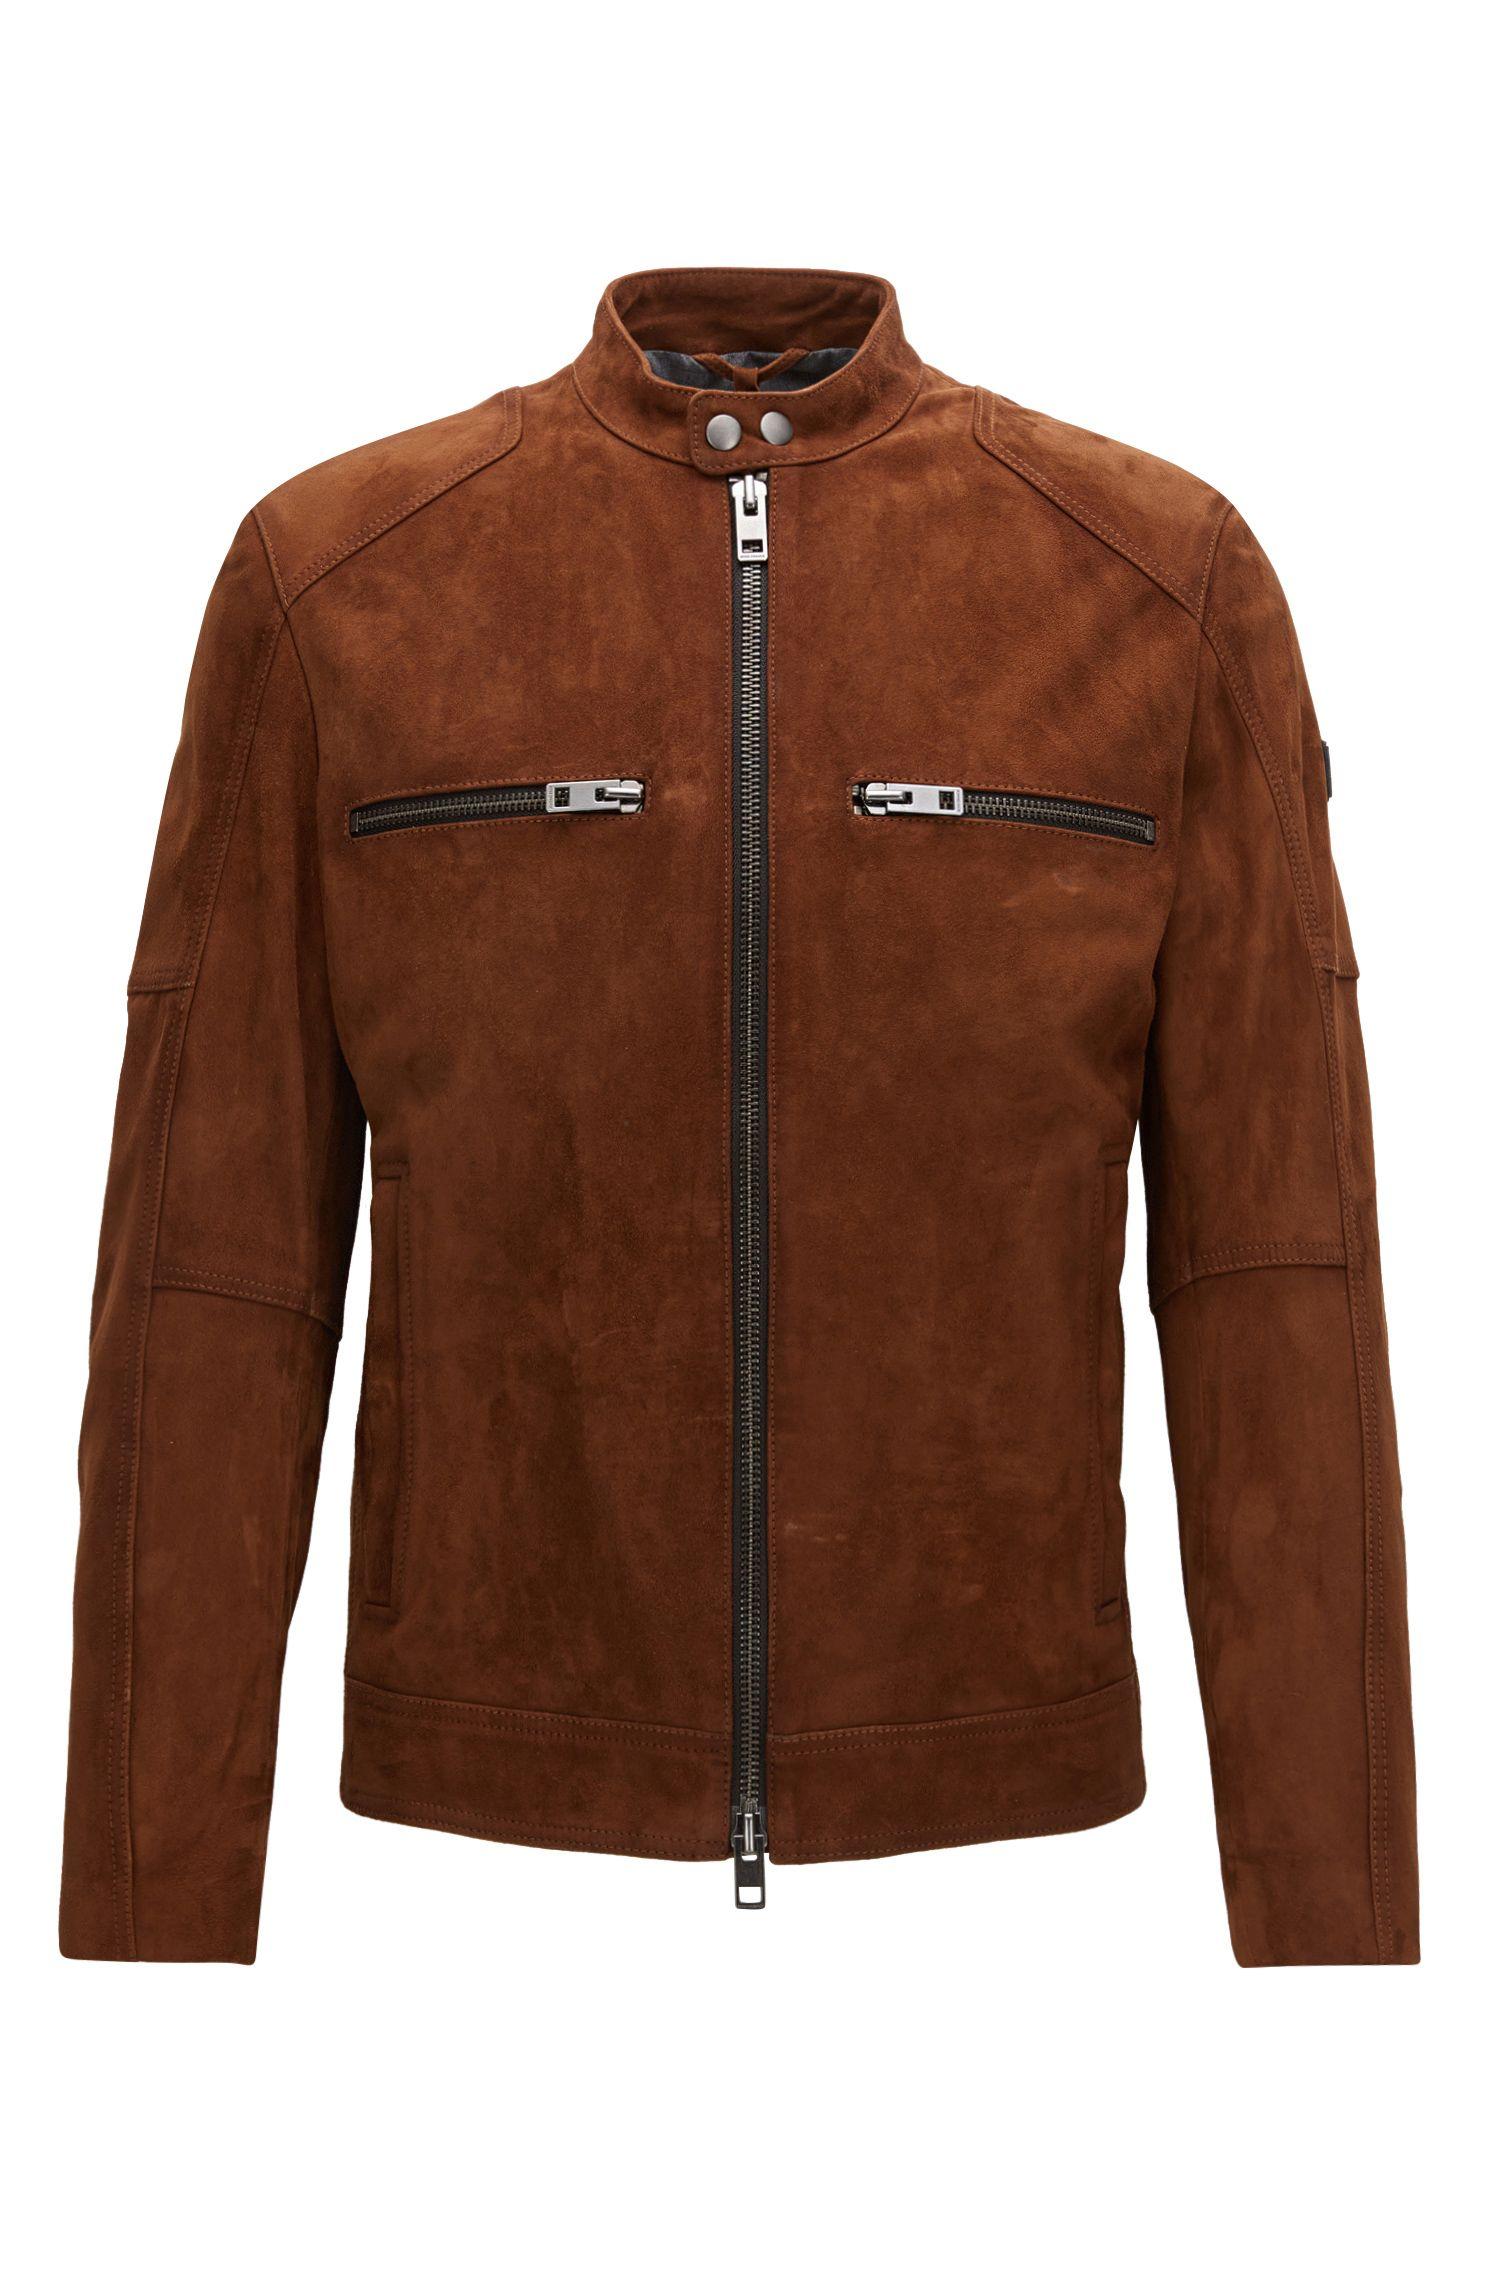 Suede Biker Jacket | Jeeazy